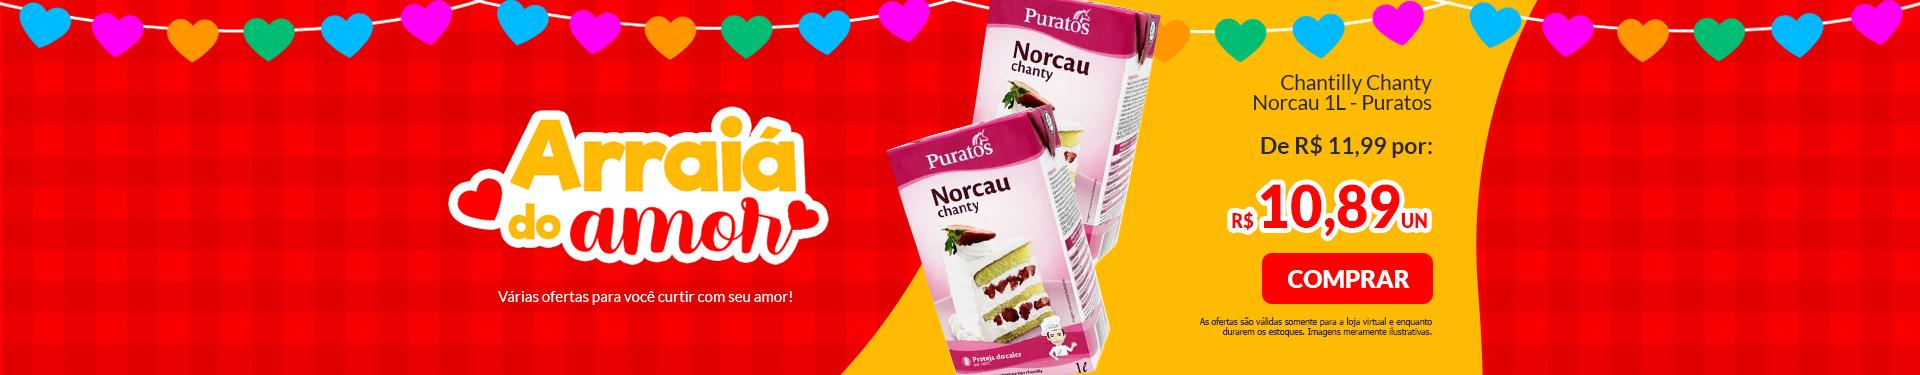 #CHANTILLY CHANTY NORCAU 1L PURATOS